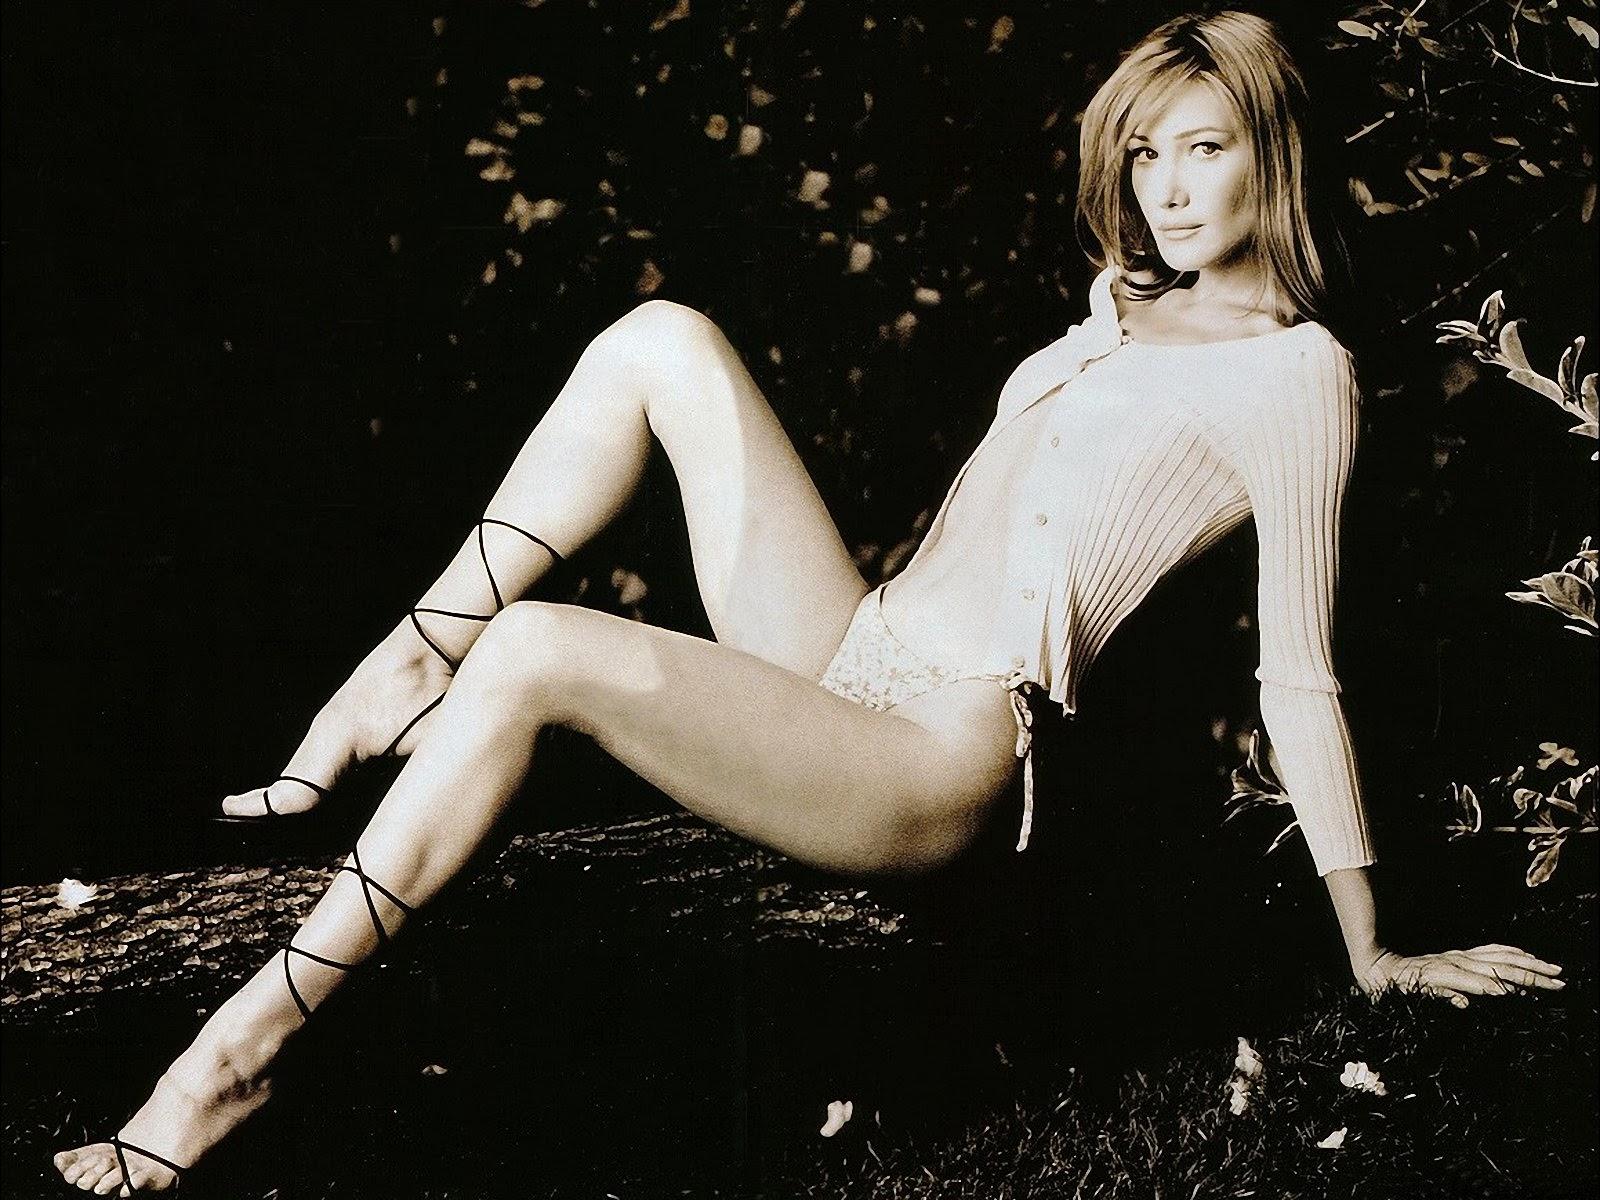 Nude dream girl ashley